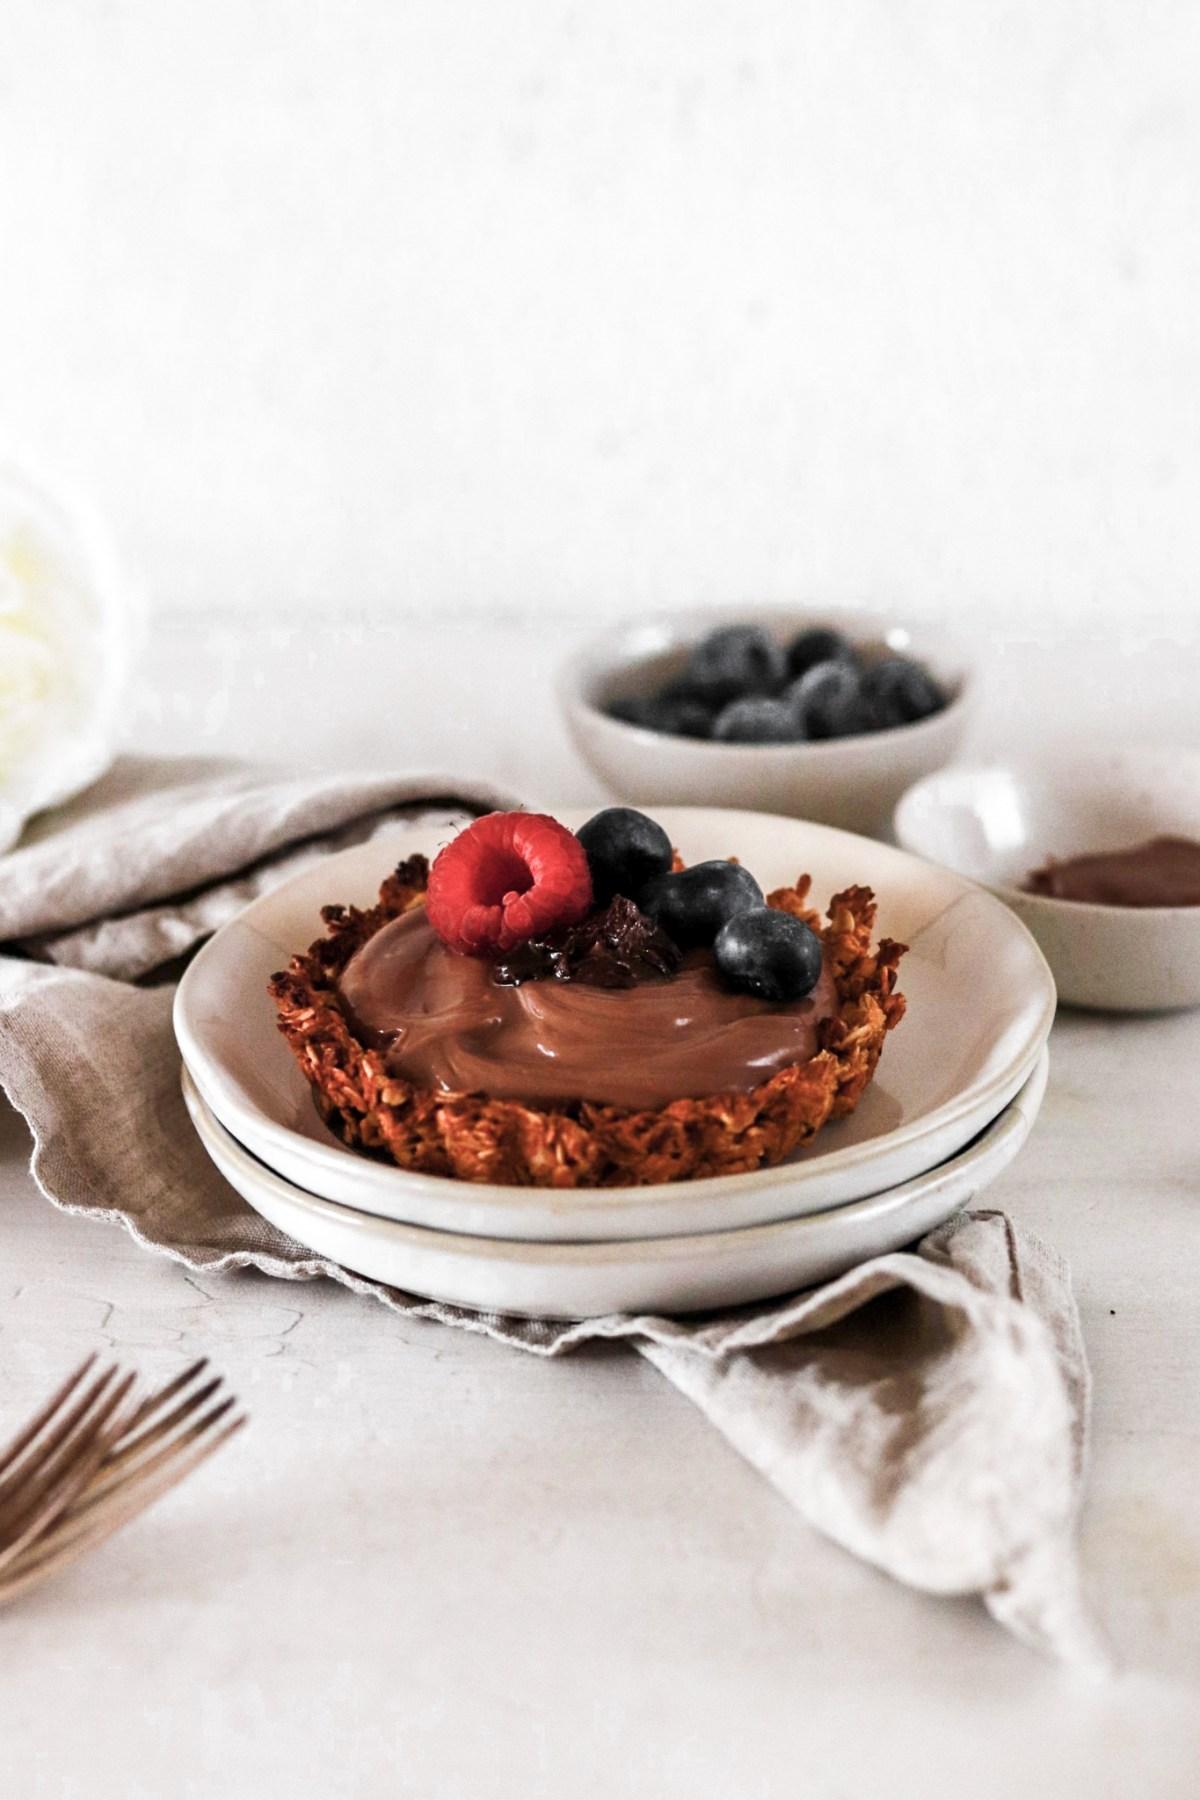 Granola Tartlet with Yogurt/Nutella Filling (Vegan, Gluten & Sugar Free) From Front